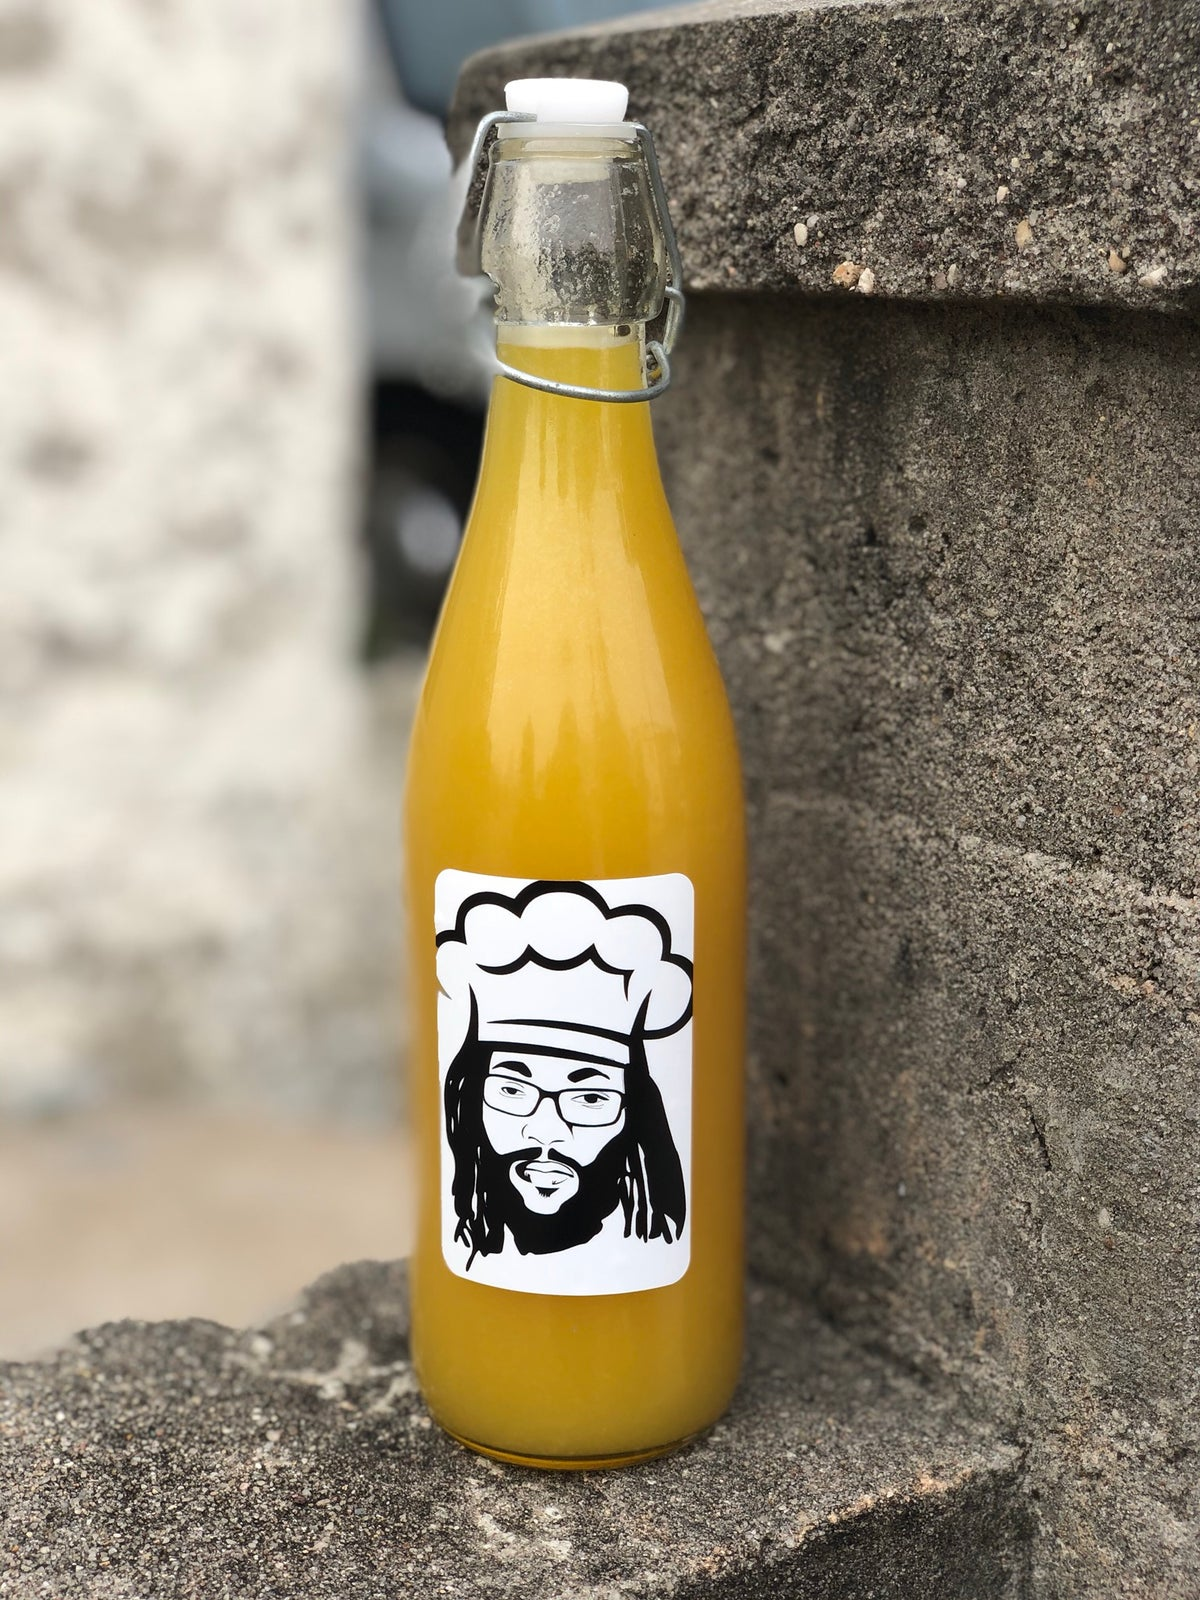 Yoni juice